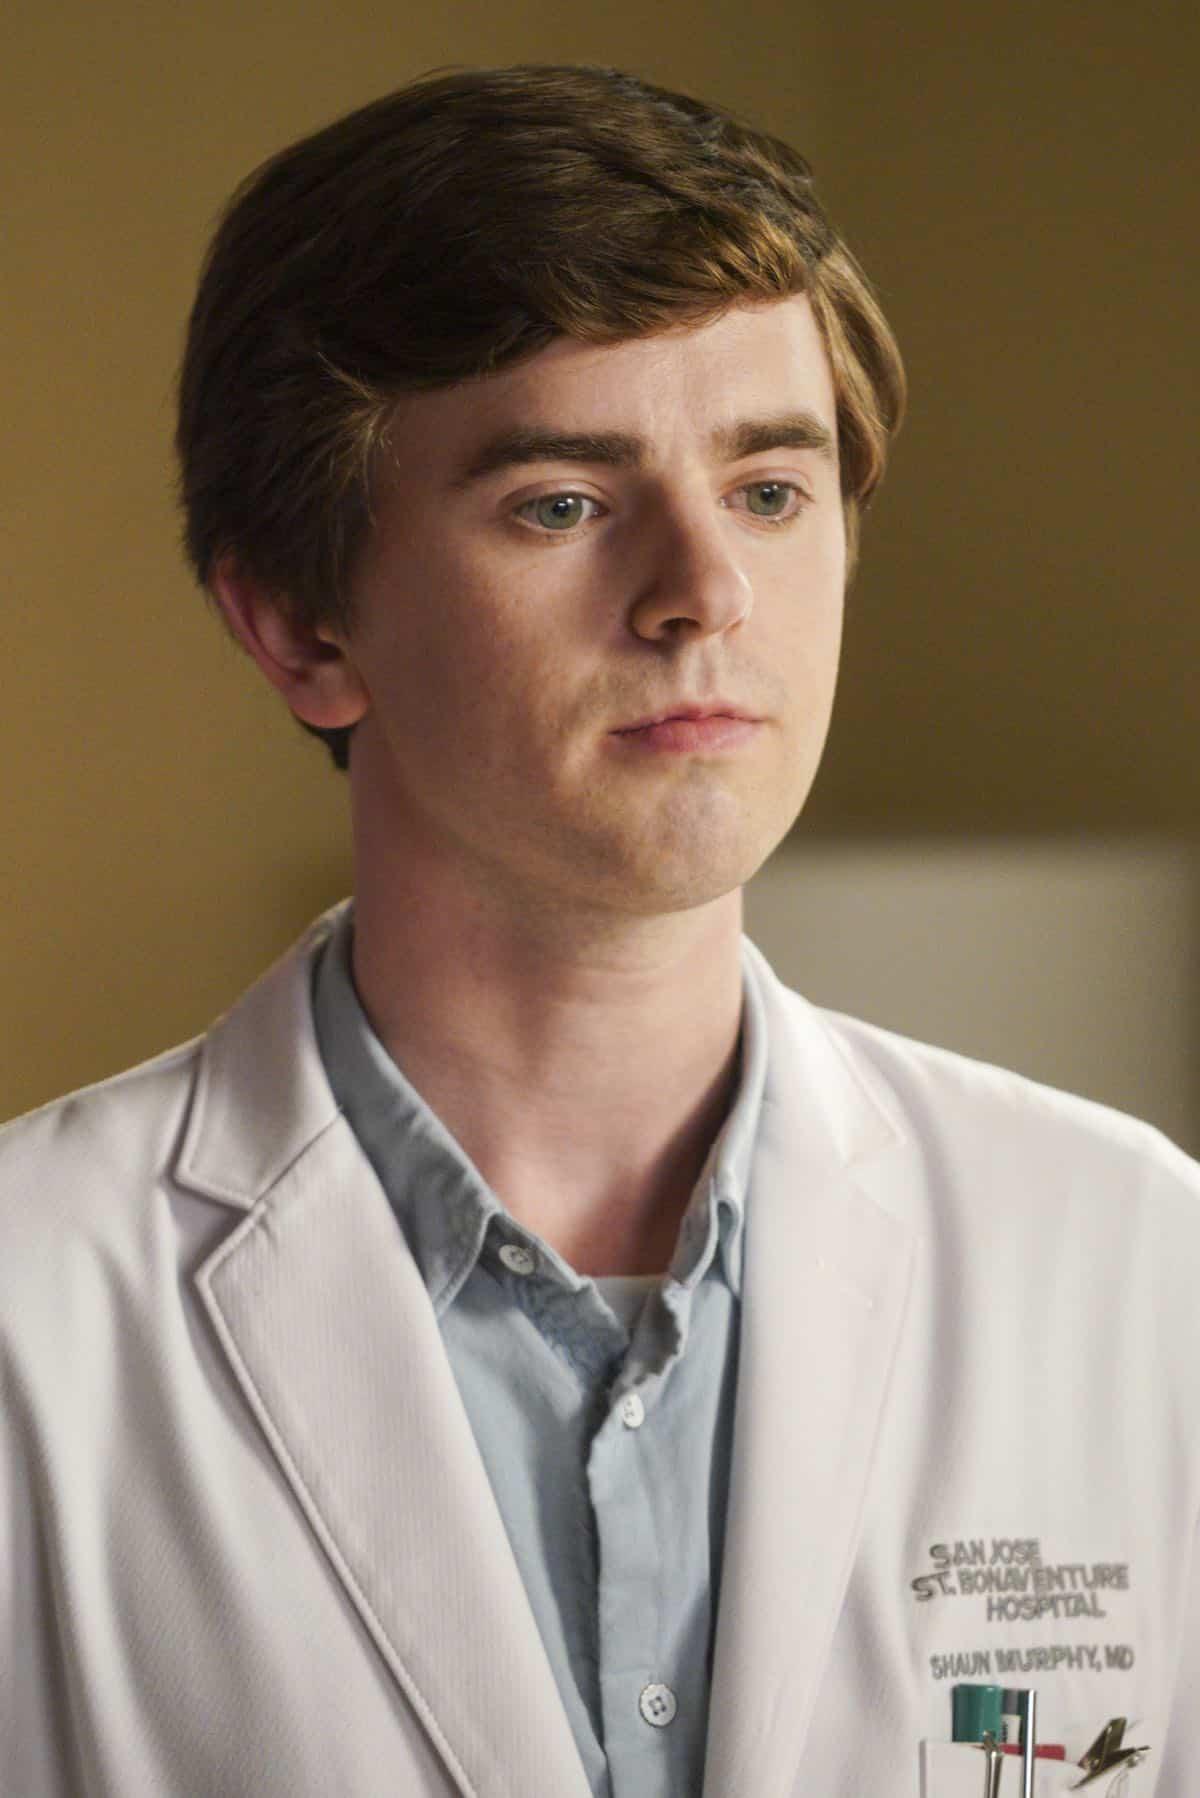 THE GOOD DOCTOR Season 3 Episode 1 Disaster 23